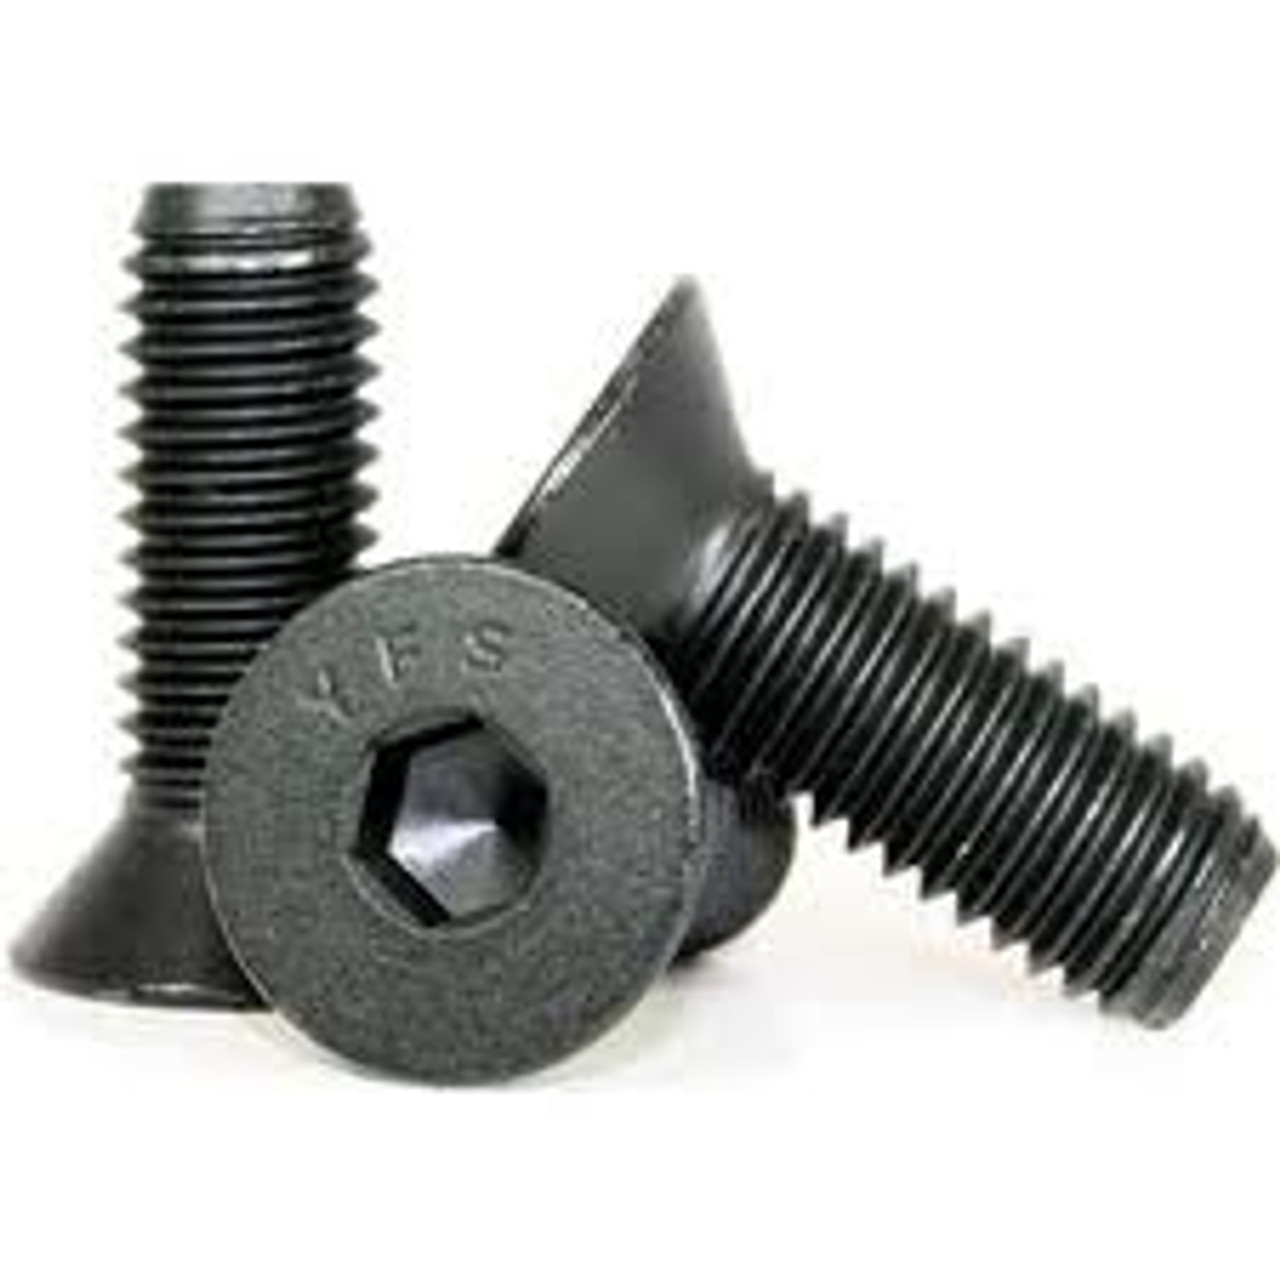 100 each Flat Head Socket Cap Screw 8-32 x 5//8